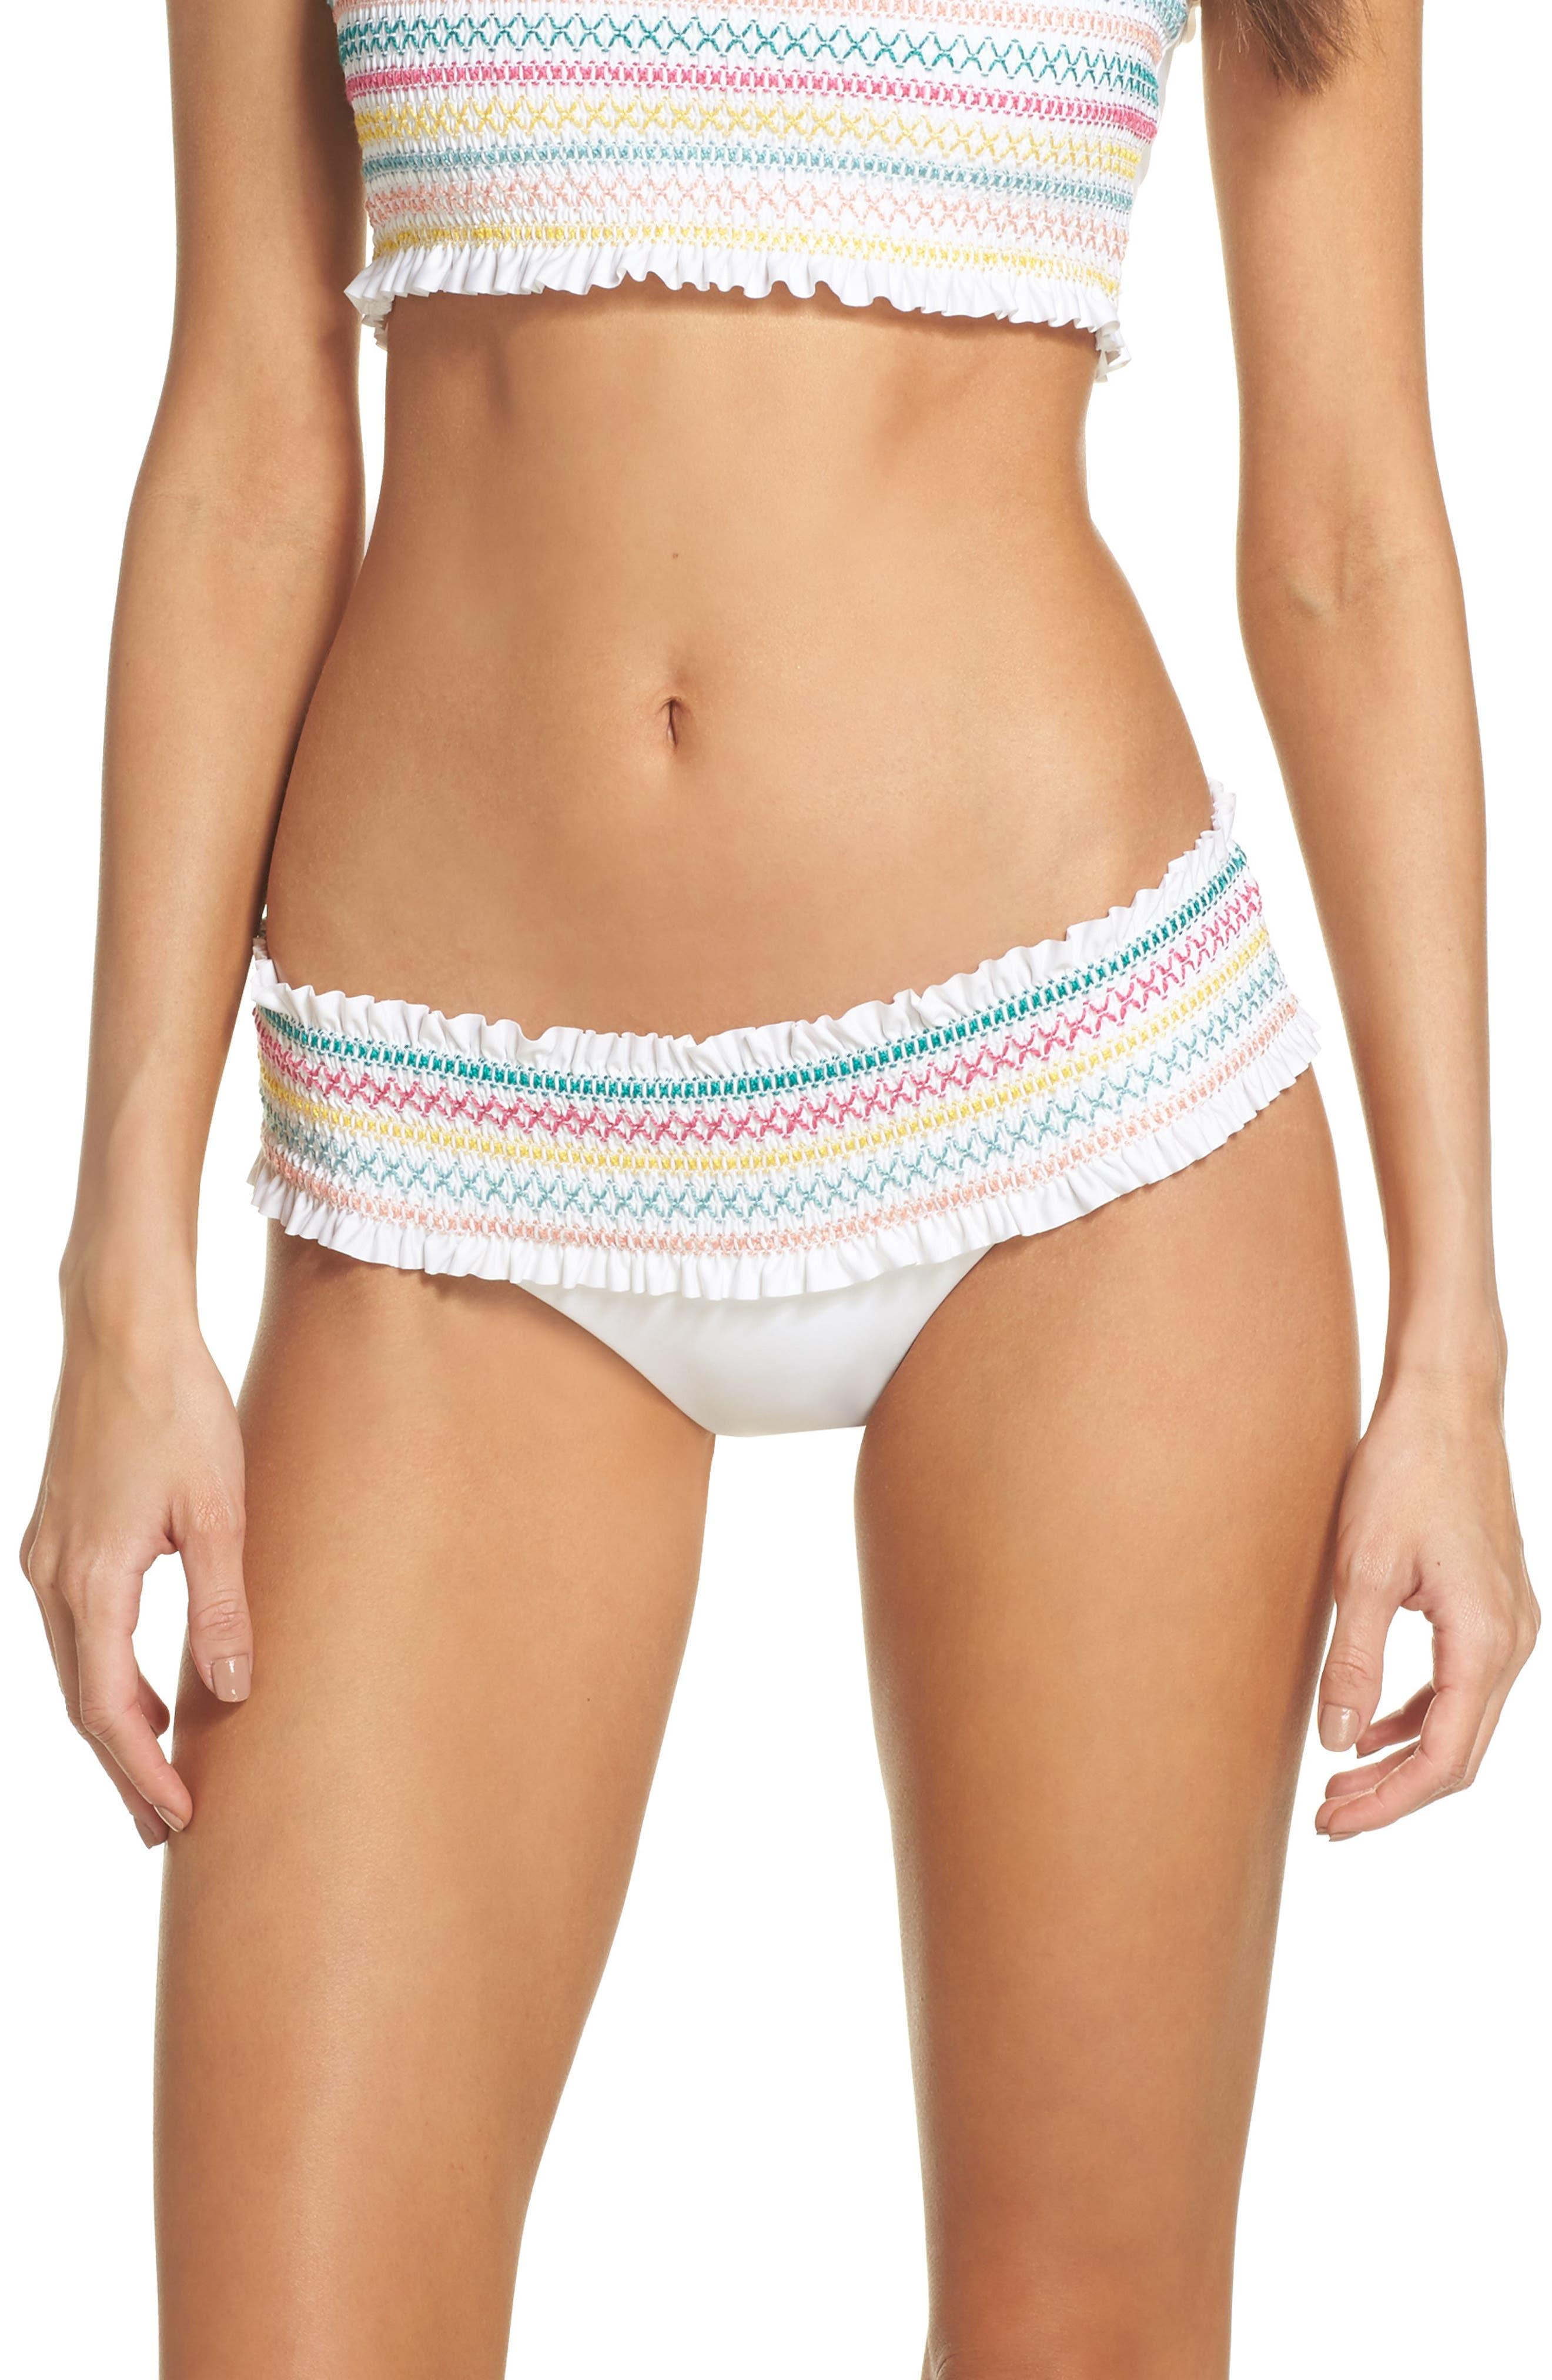 Crystal Cove Smocked Bikini Bottoms,                             Main thumbnail 1, color,                             White